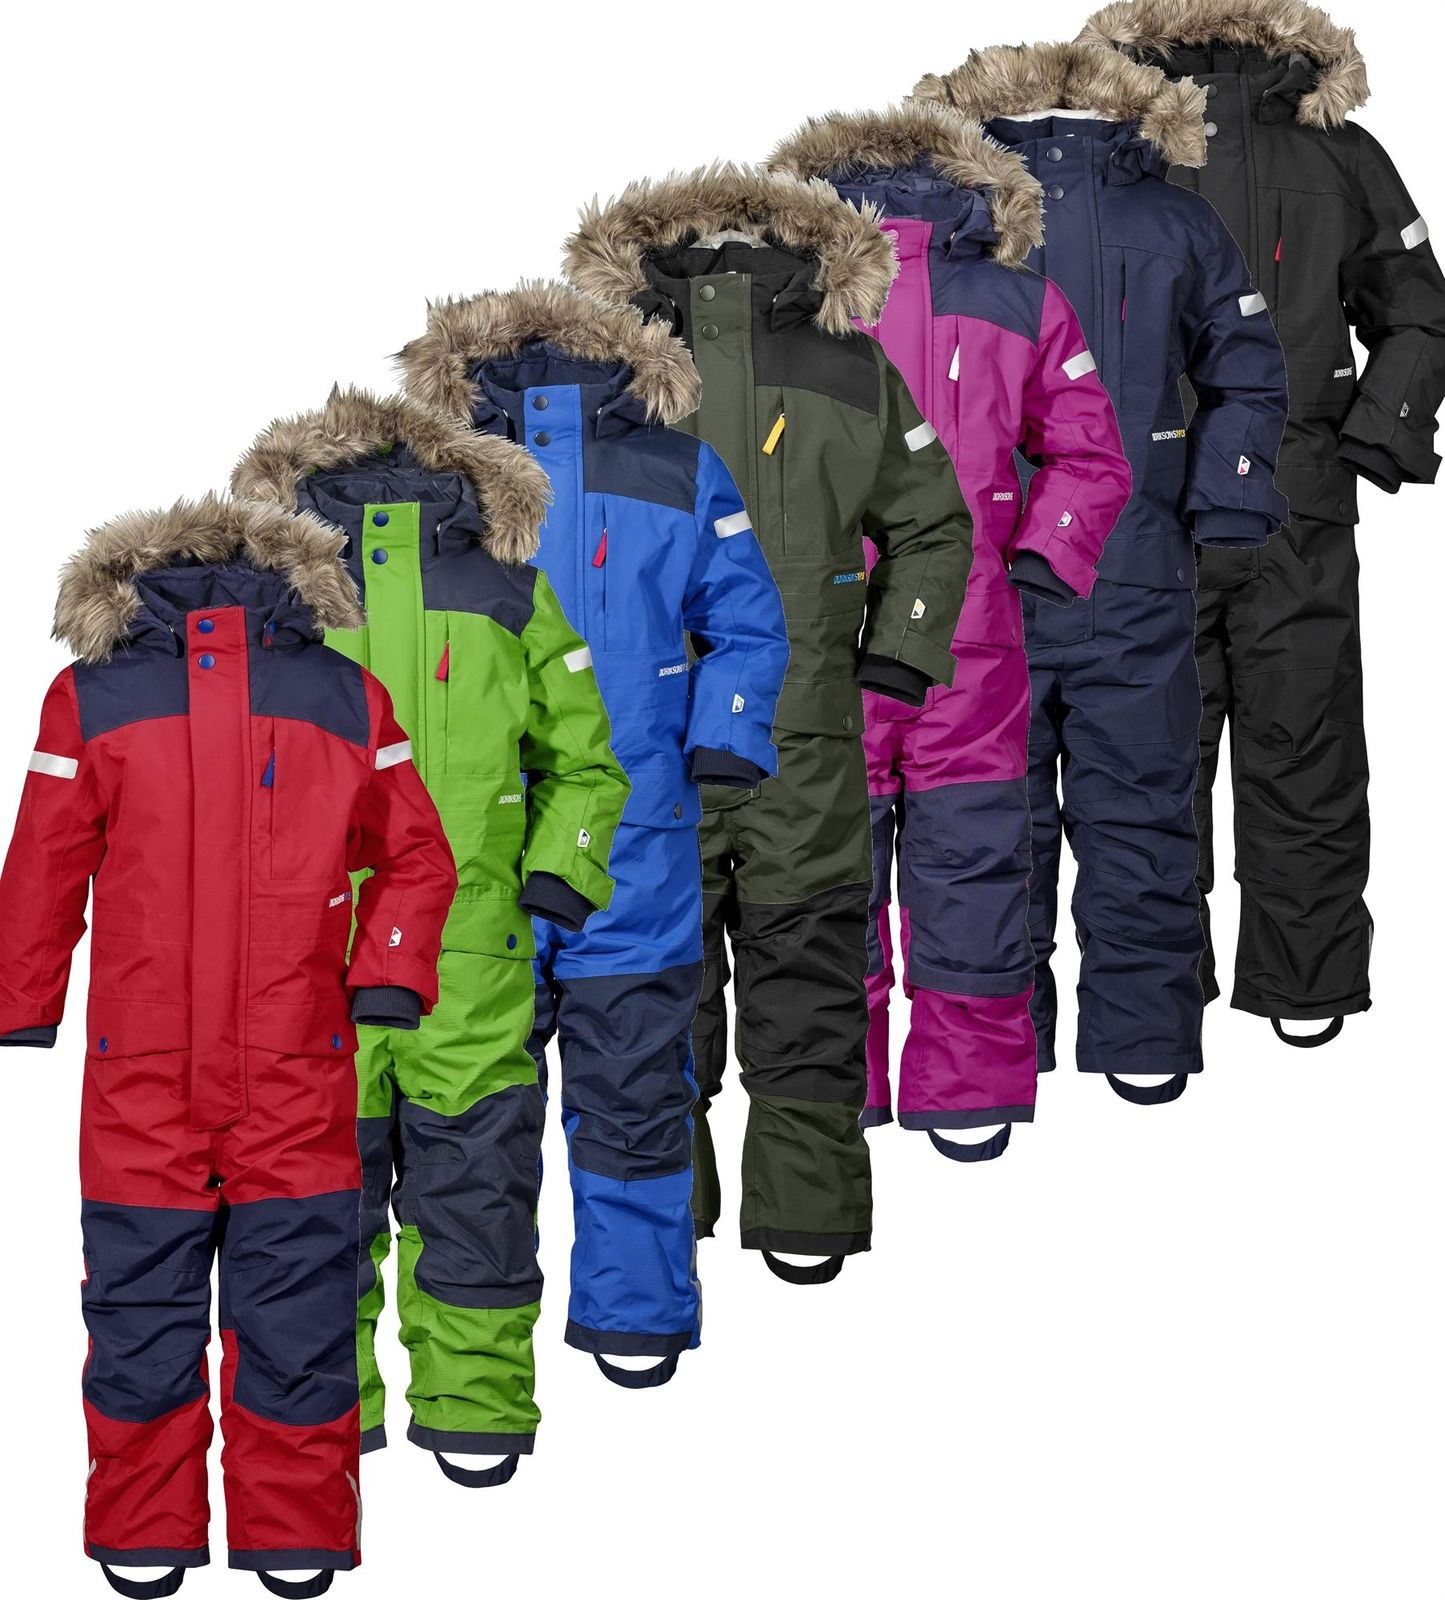 3eed69d99 Didriksons Bjornen Kids Coverall Snowsuit - Run Charlie